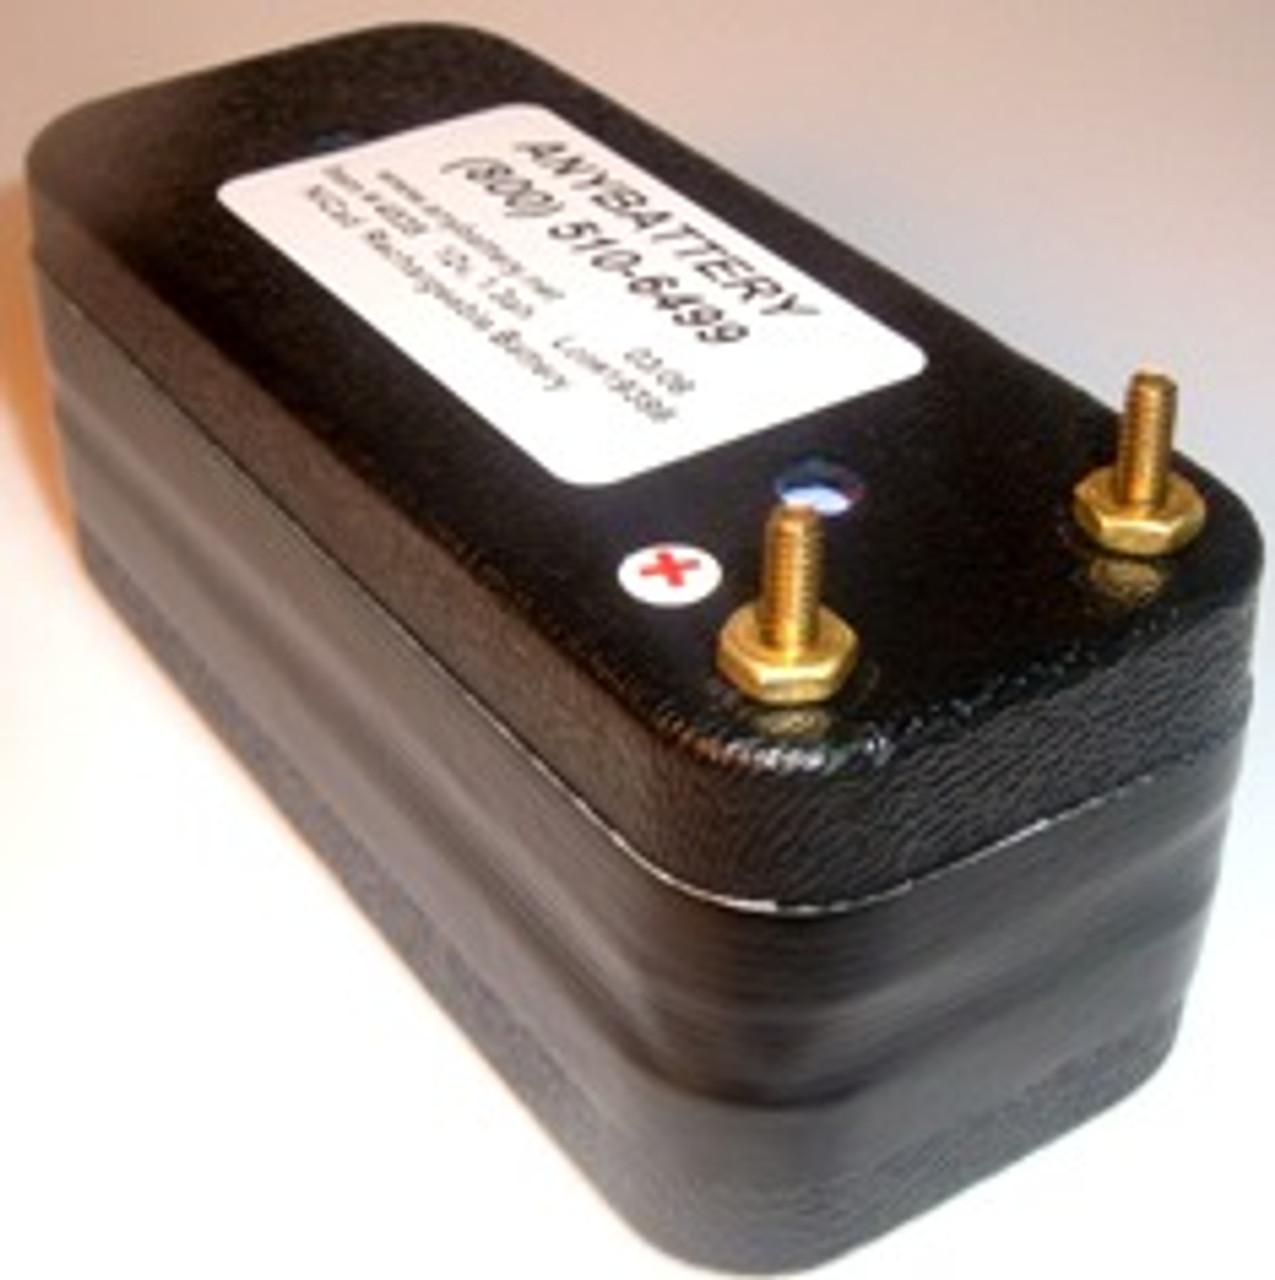 Rauland Responder III Battery 401907-105